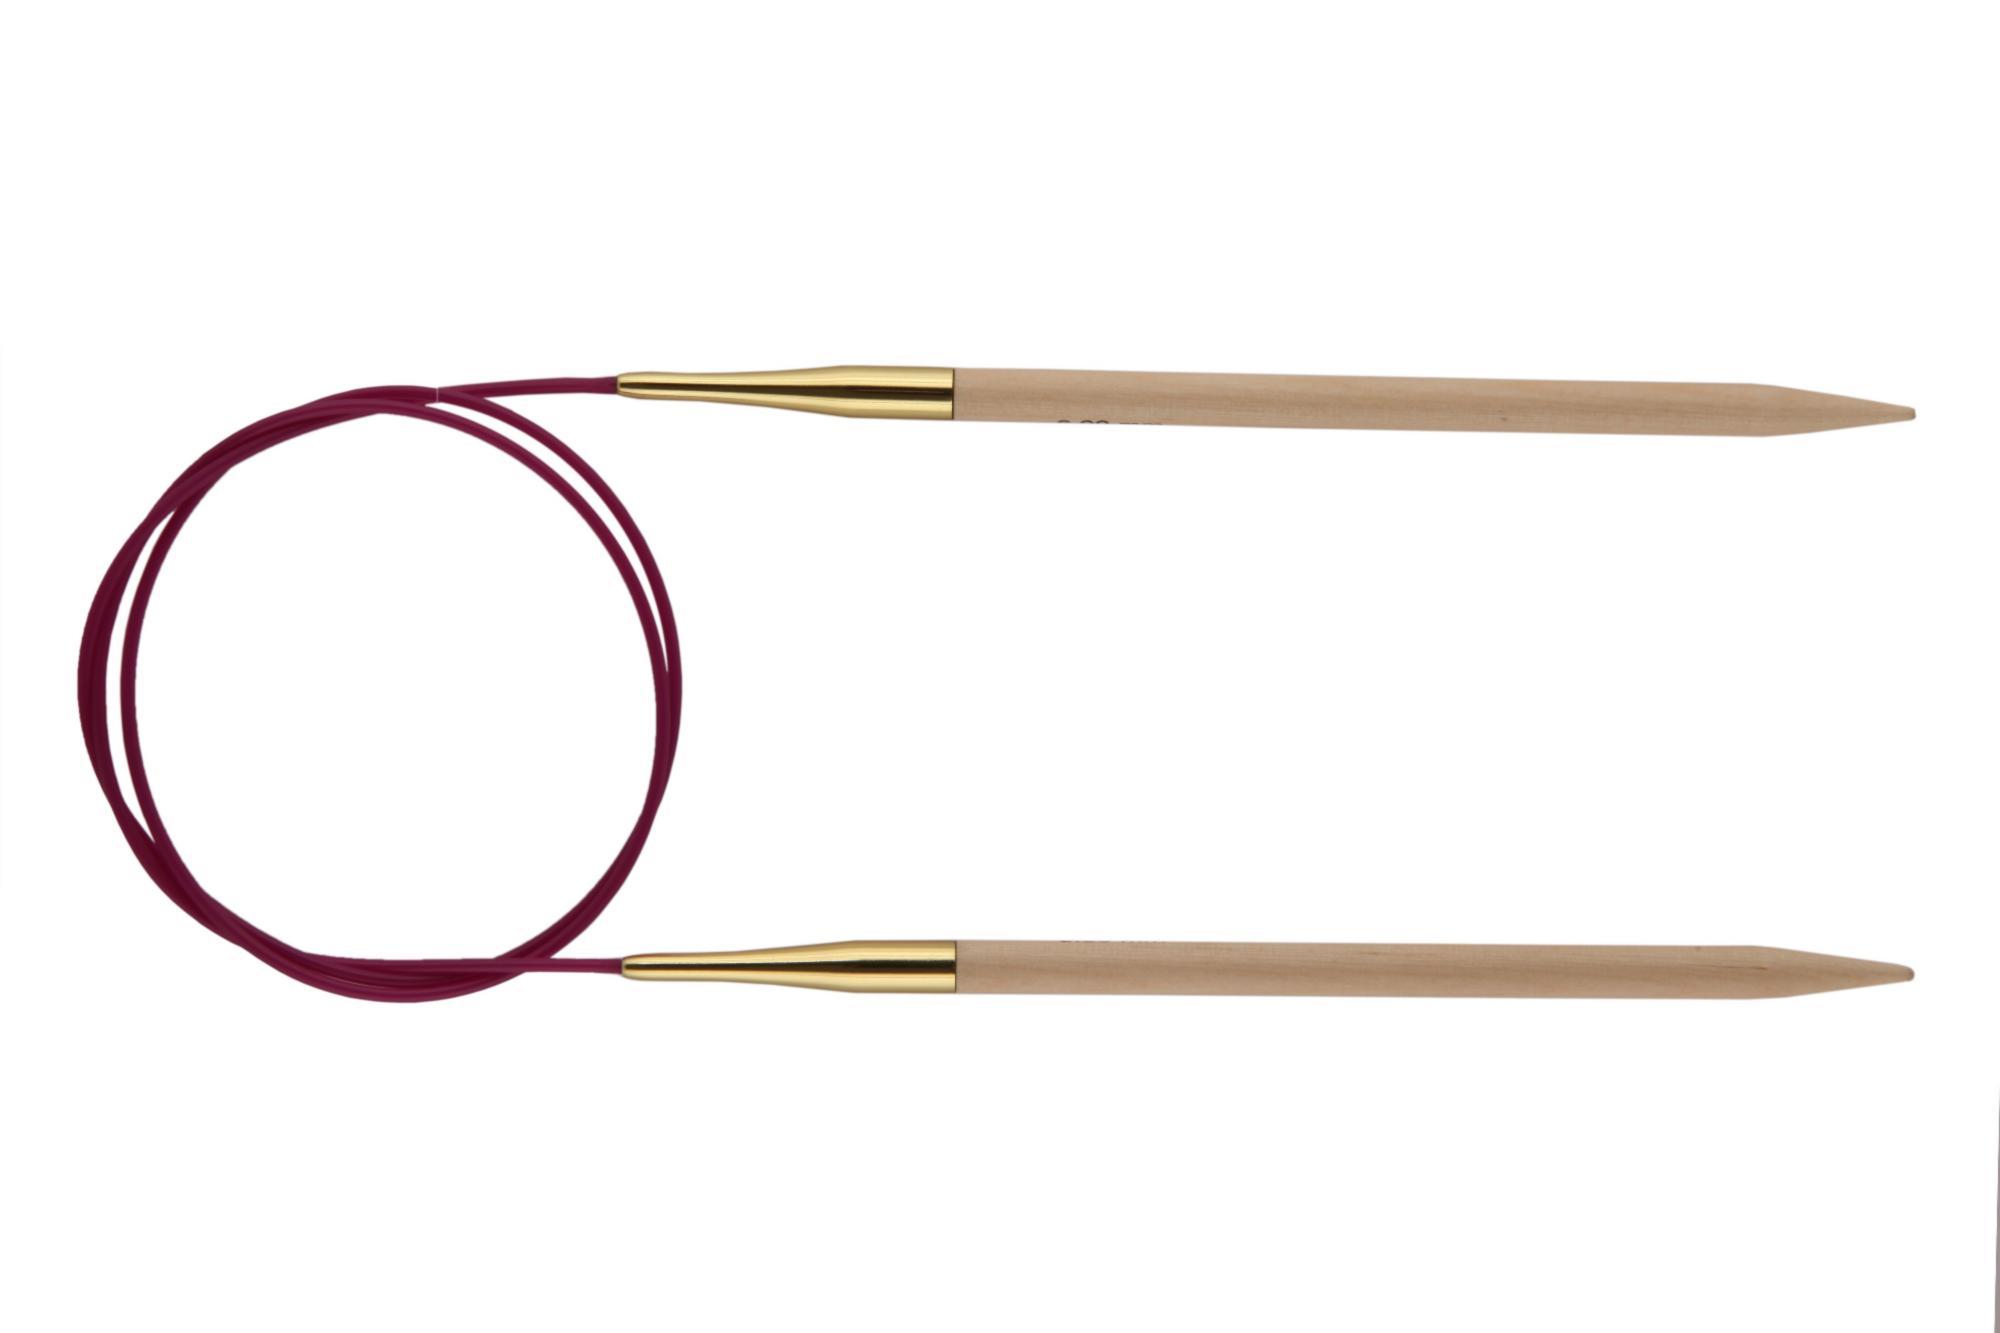 Спицы круговые 100 см Basix Birch Wood KnitPro, 35395, 4.50 мм